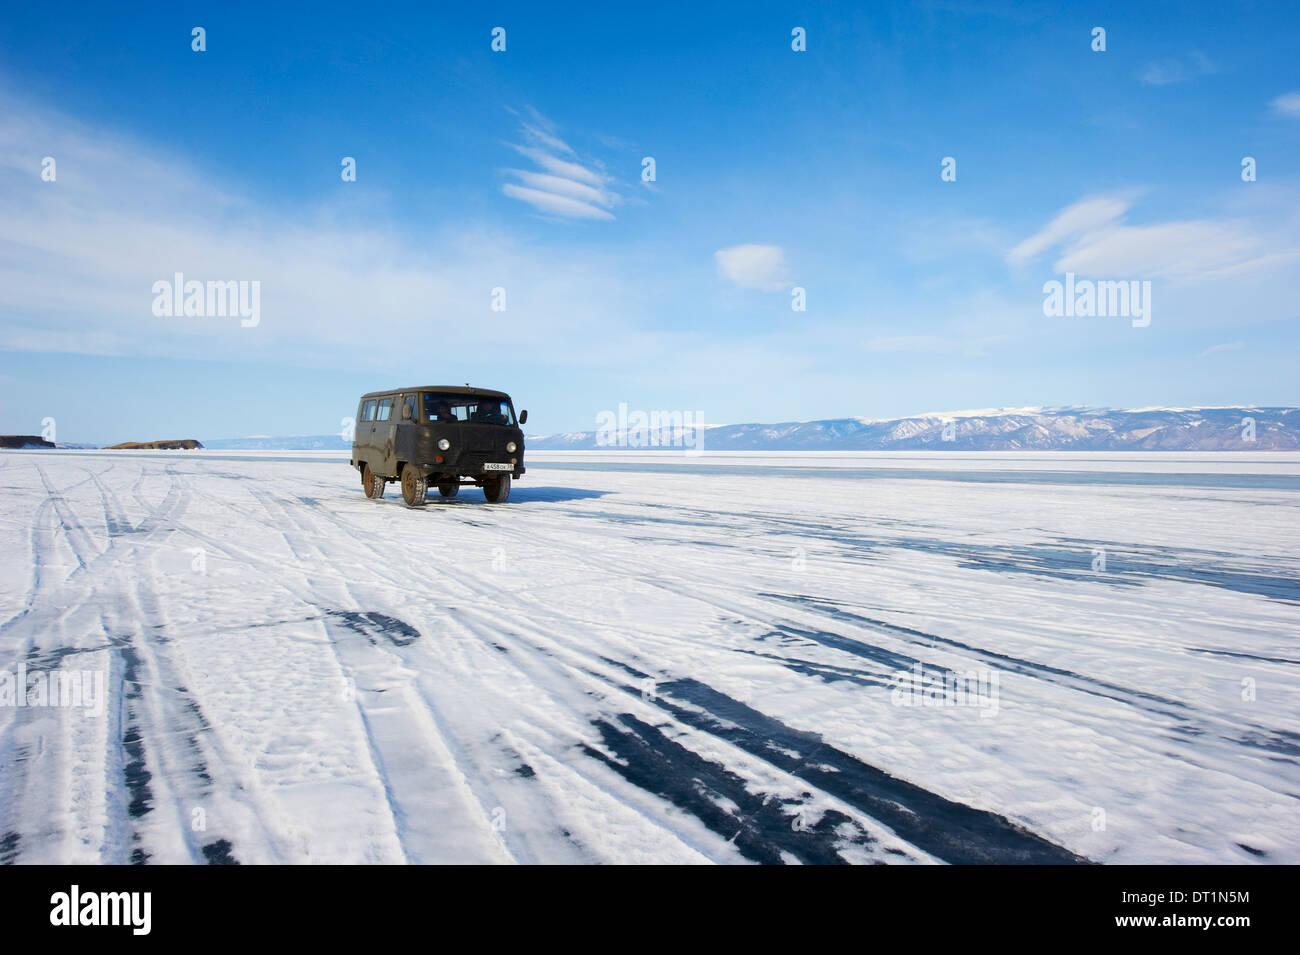 Driving on the lake, Maloe More (Little Sea), Olkhon island, Lake Baikal, UNESCO Site, Irkutsk Oblast, Siberia, Russia - Stock Image